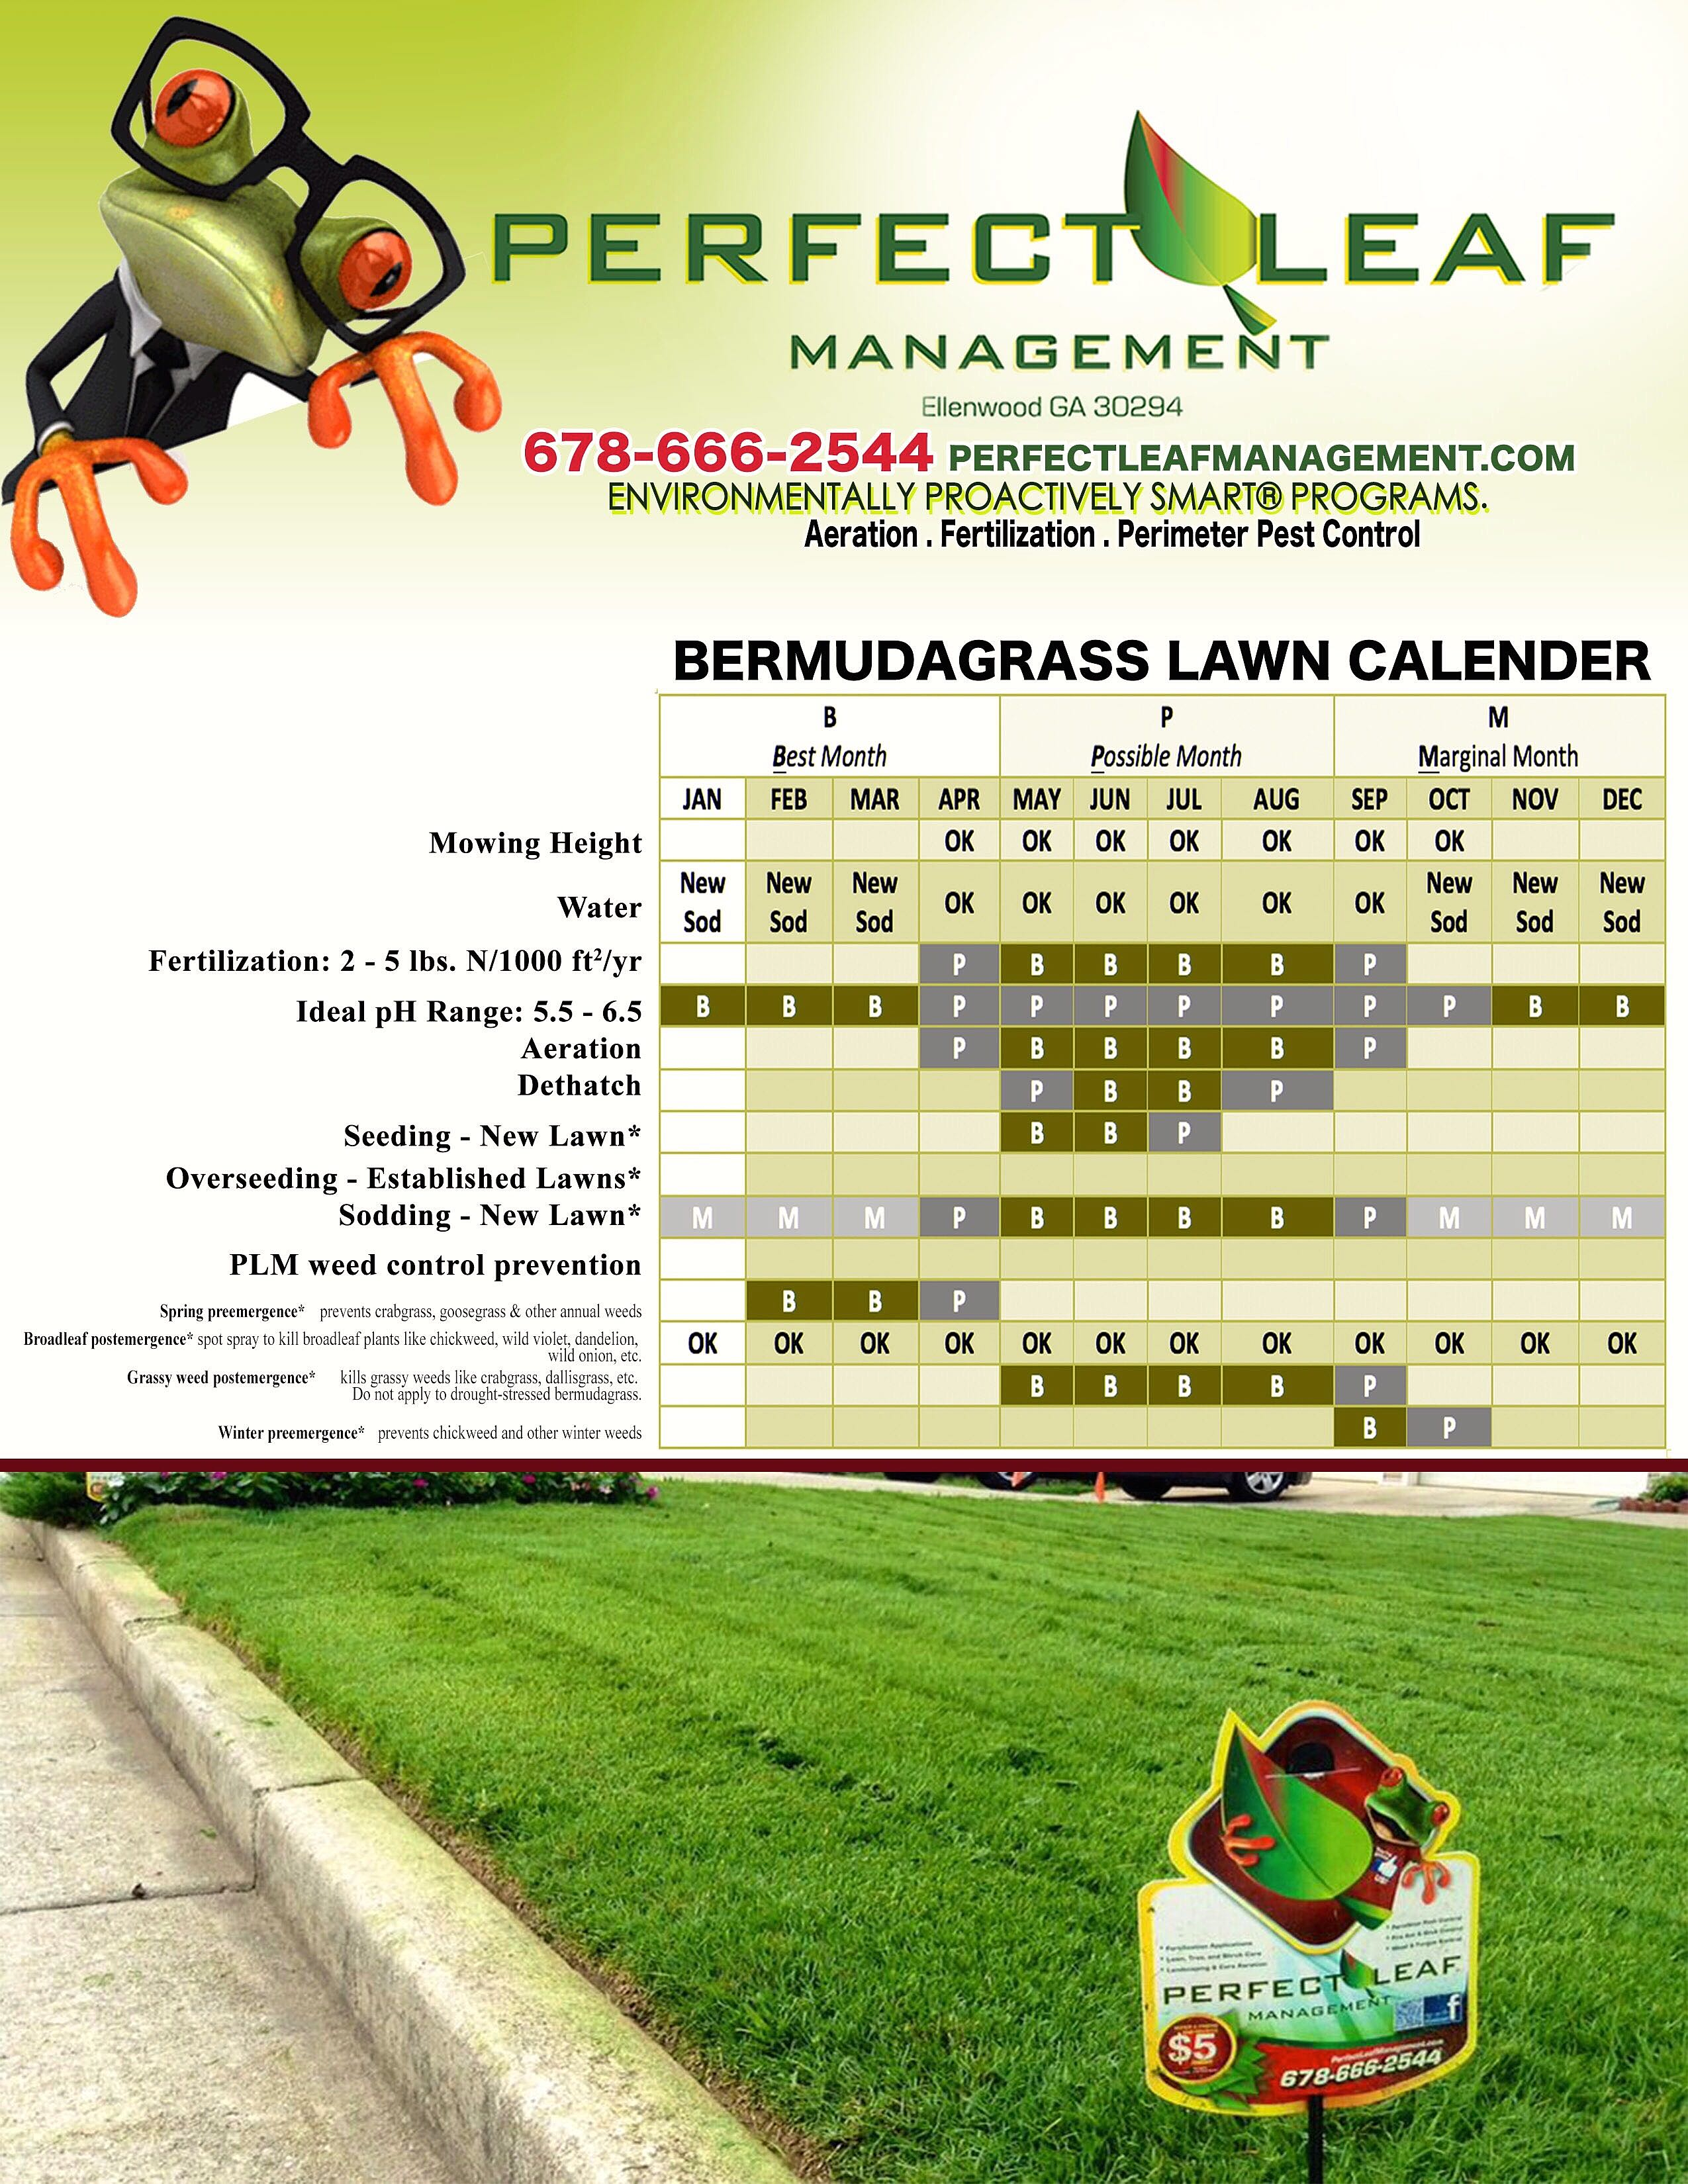 perfect leaf management lawn care treatment design atlanta ga perfect leaf management lawn care treatment design atlanta ga